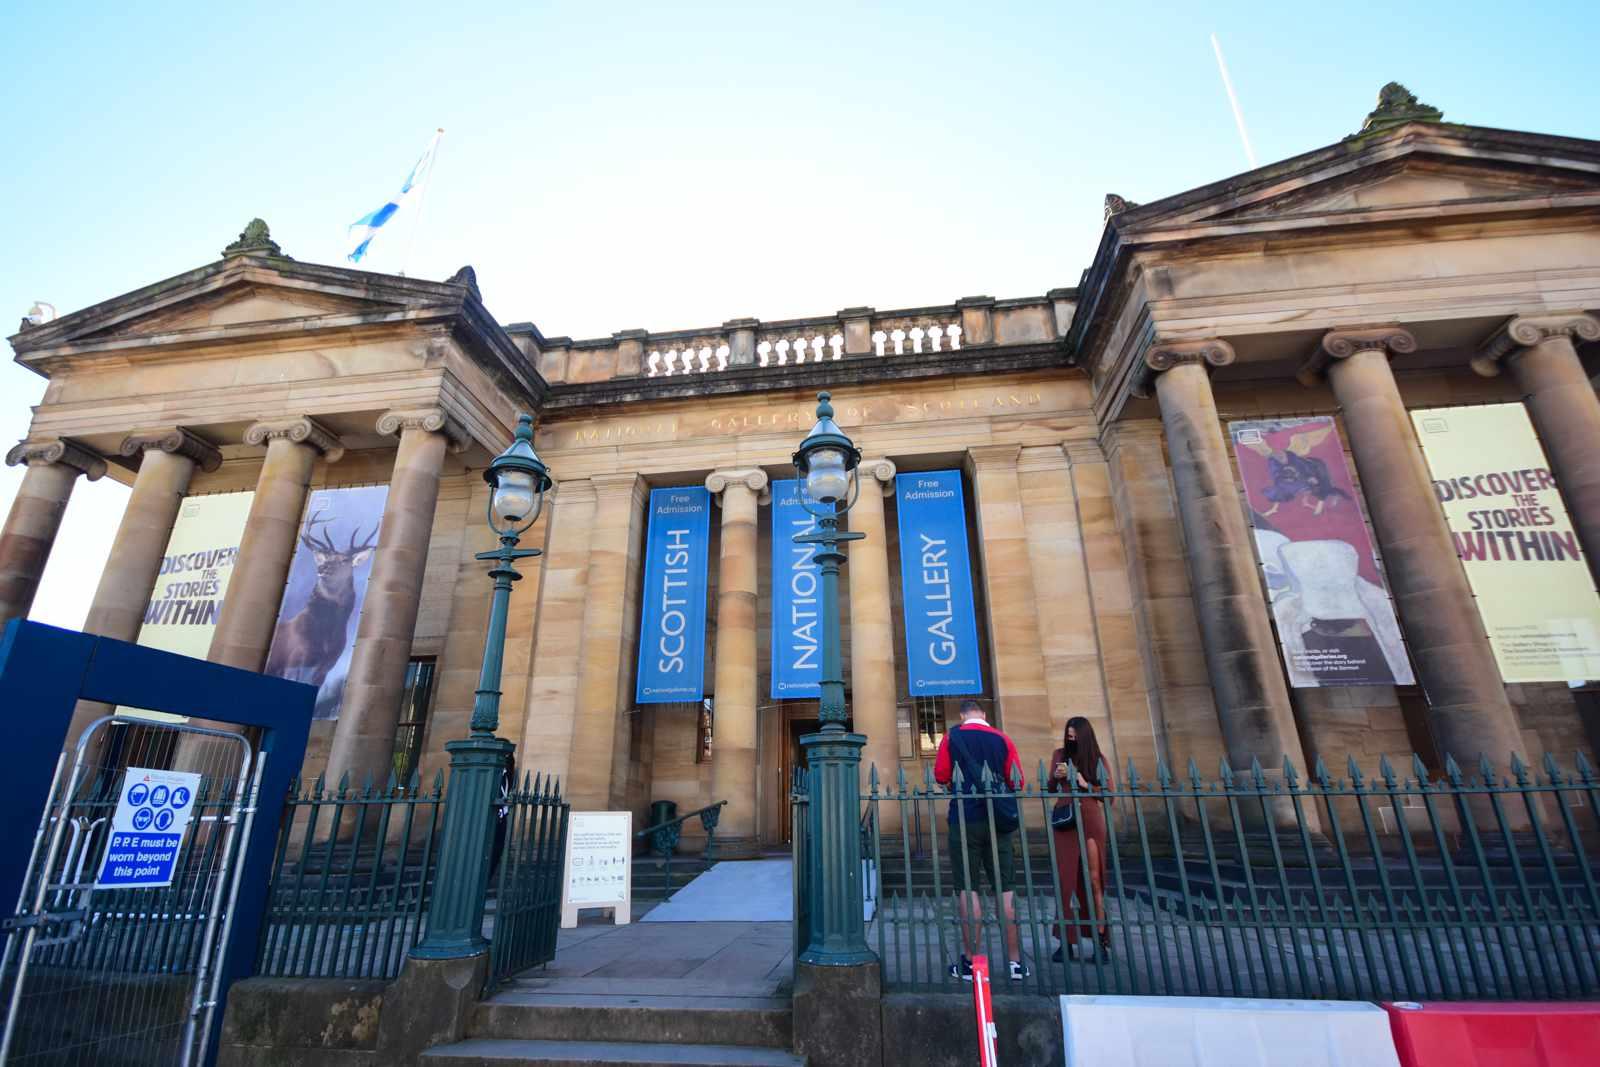 The Scottish National Gallery in Edinburgh, Scotland